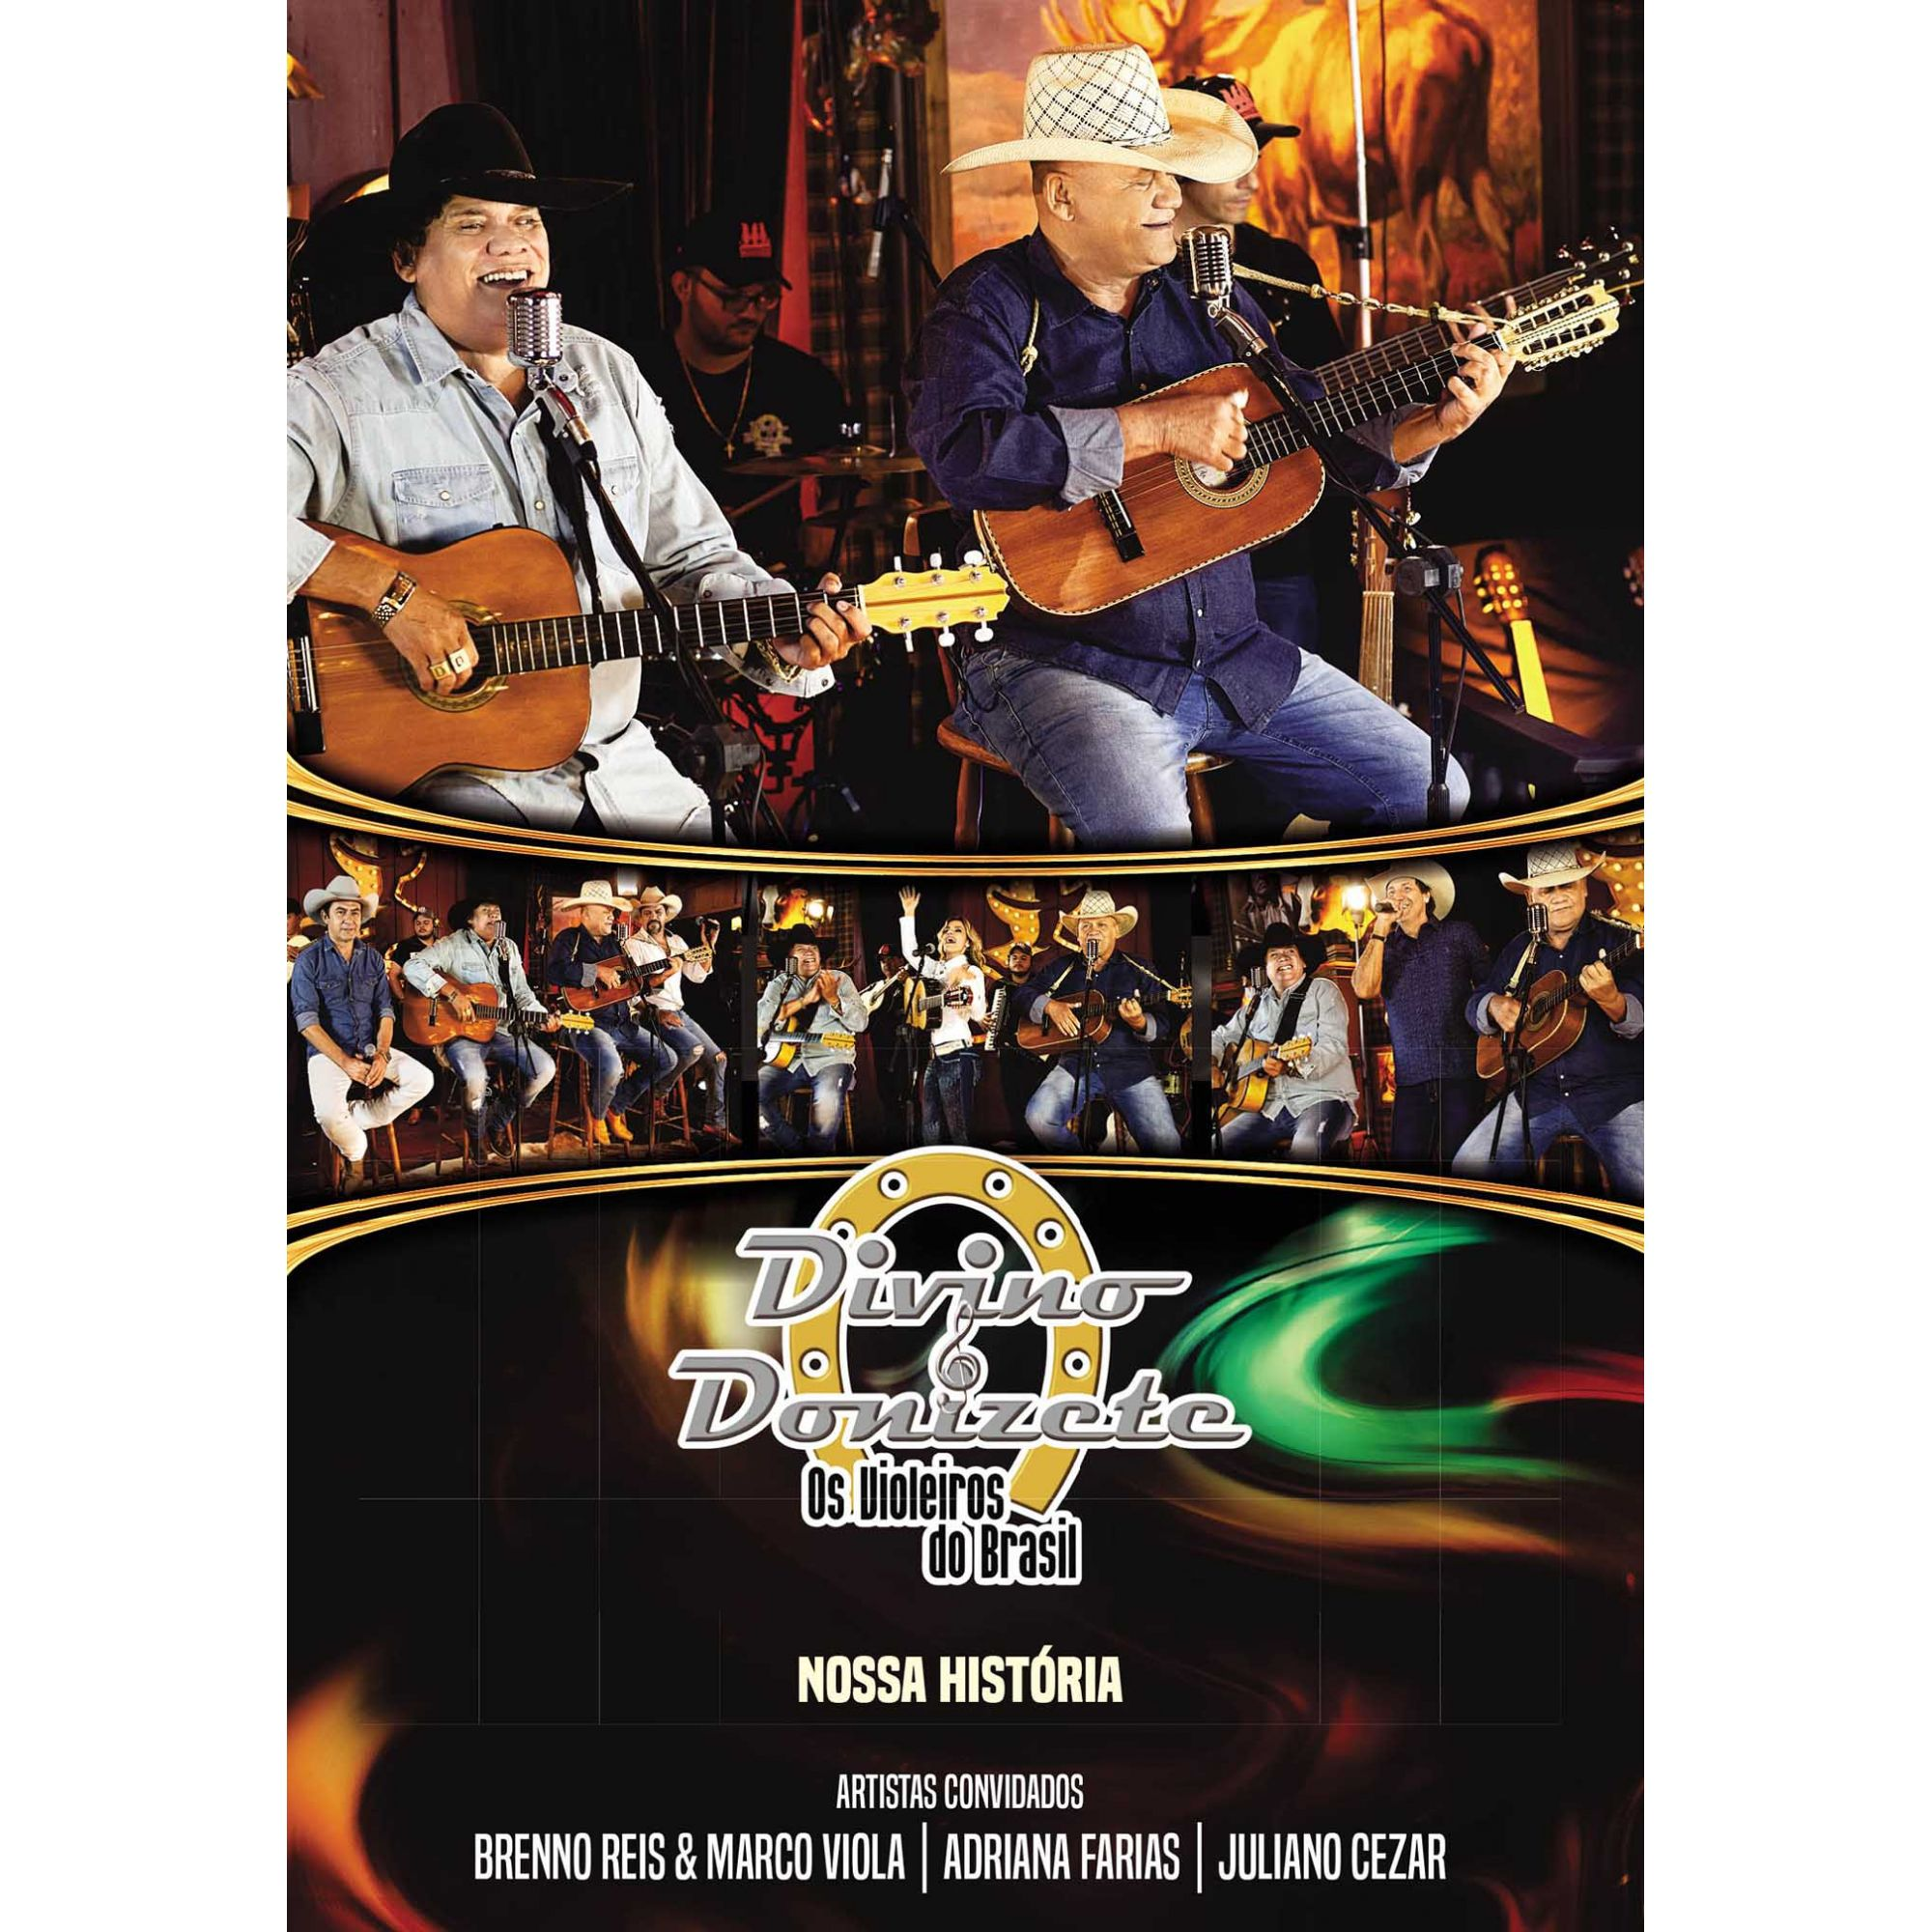 DVD Divino & Donizete - Nossa História